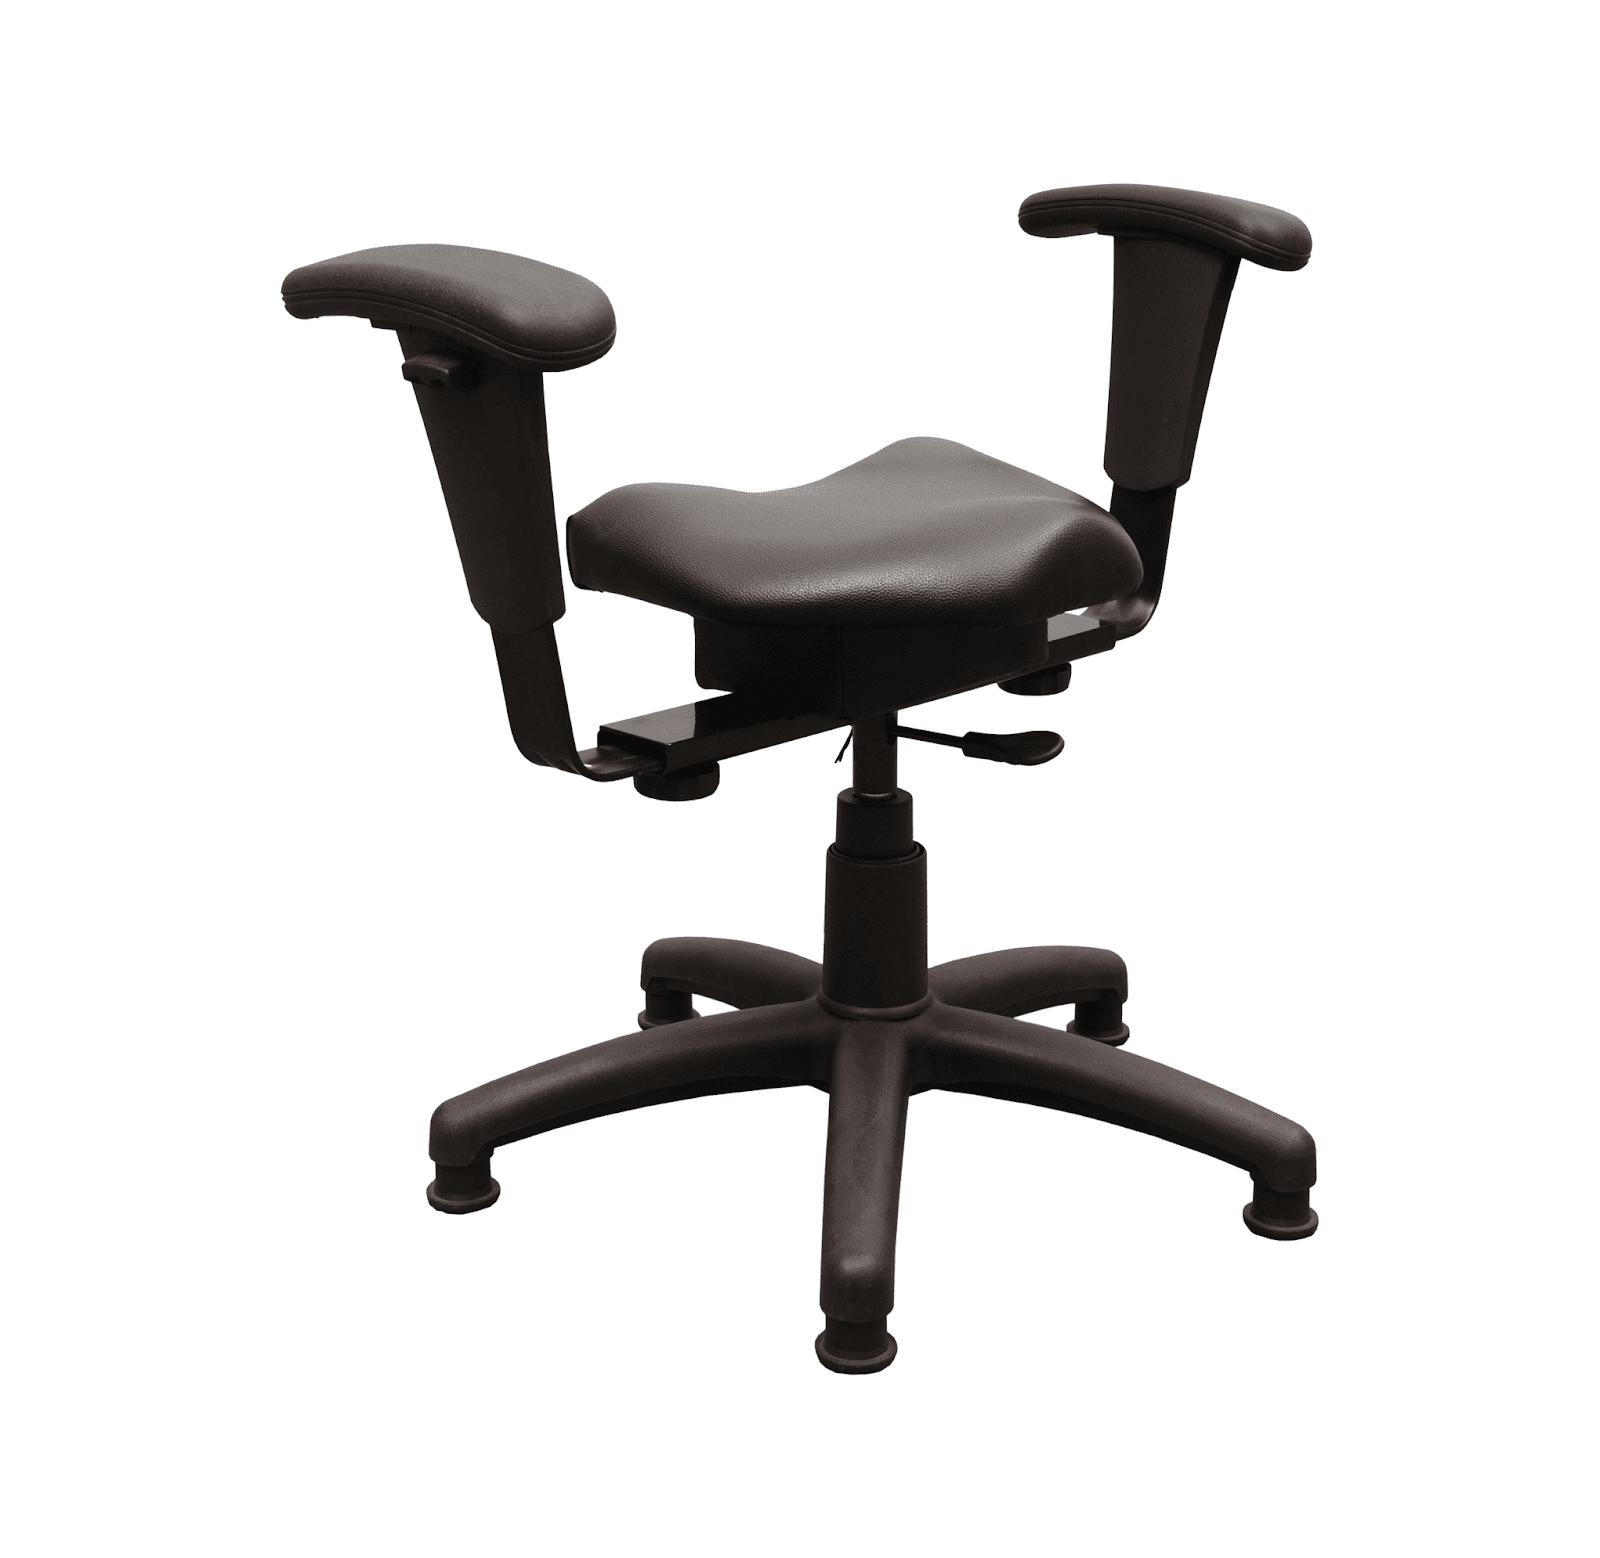 wobble chair chiropractic pleasanton ca